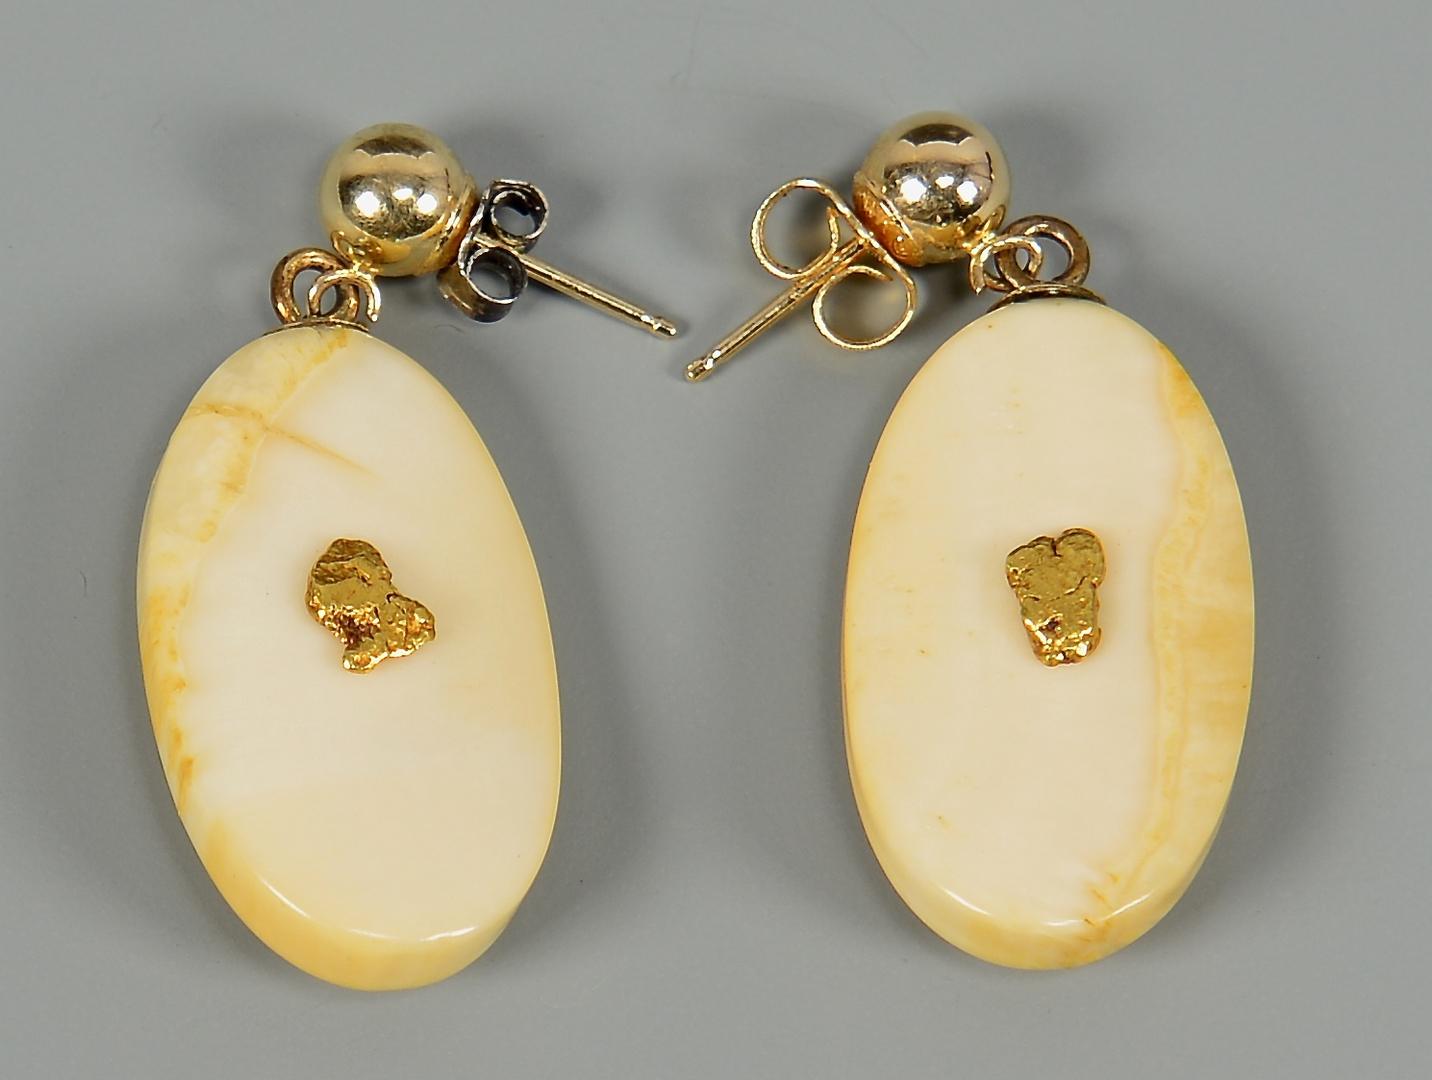 Lot 4010144 Alaskan Scrimshaw Ivory Amp Gold Nugget Jewelry